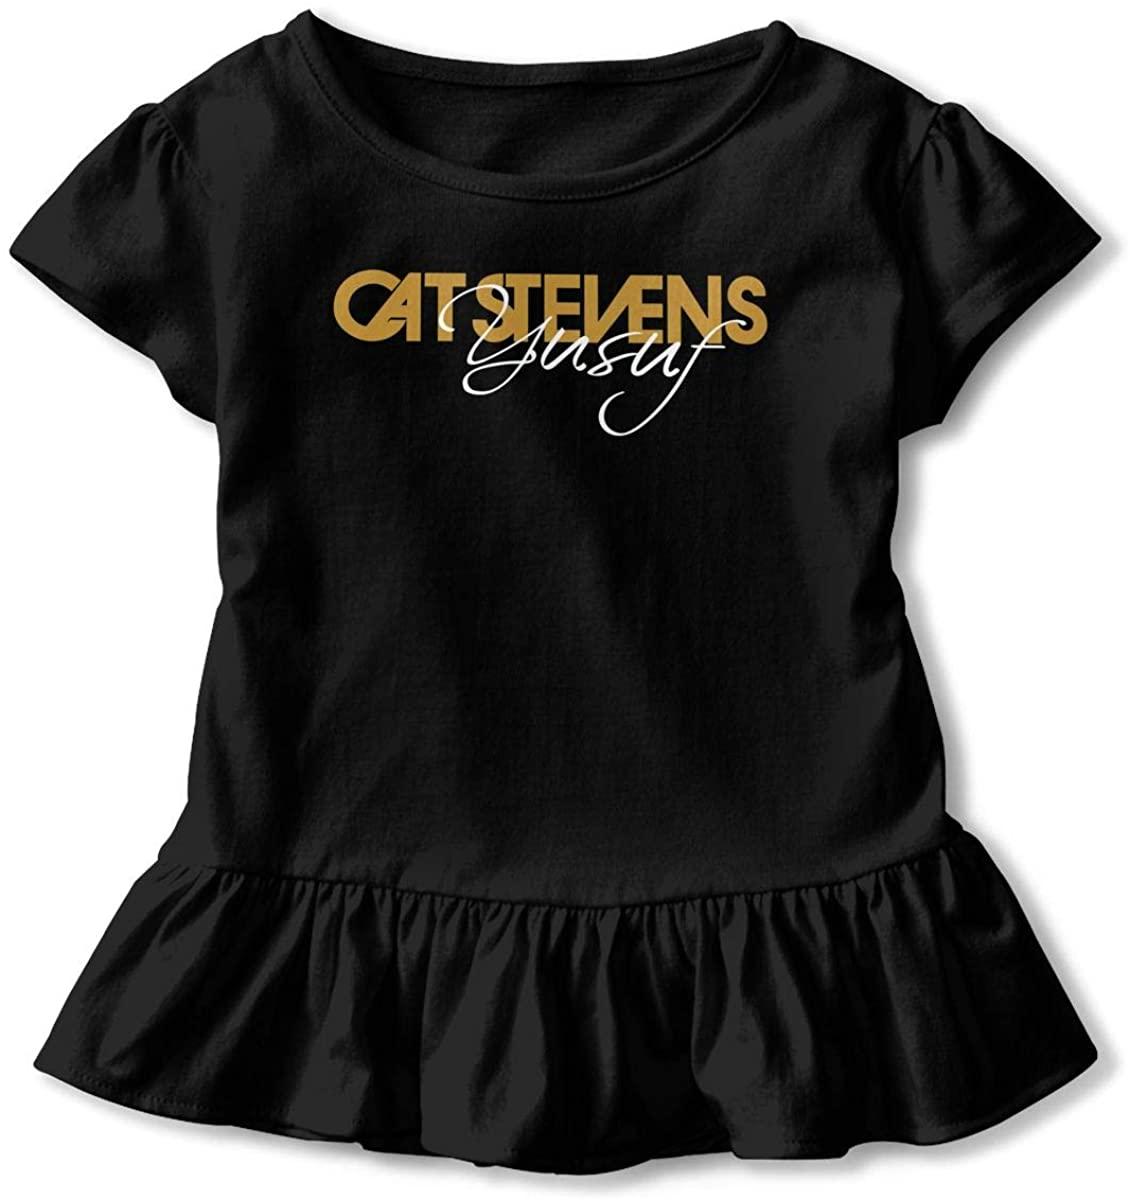 2-6T Baby Soft Lotus Leaf Edge Short Sleeve tee-Cat Stevens Logo Black